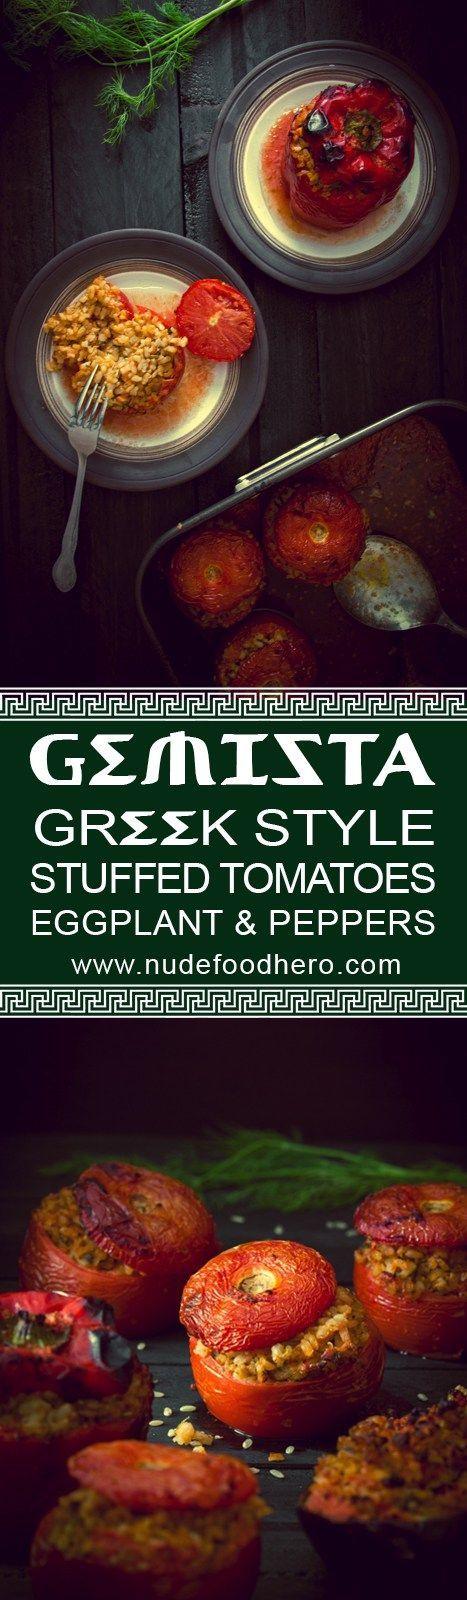 Gemista - Greek Style Stuffed Vegetables